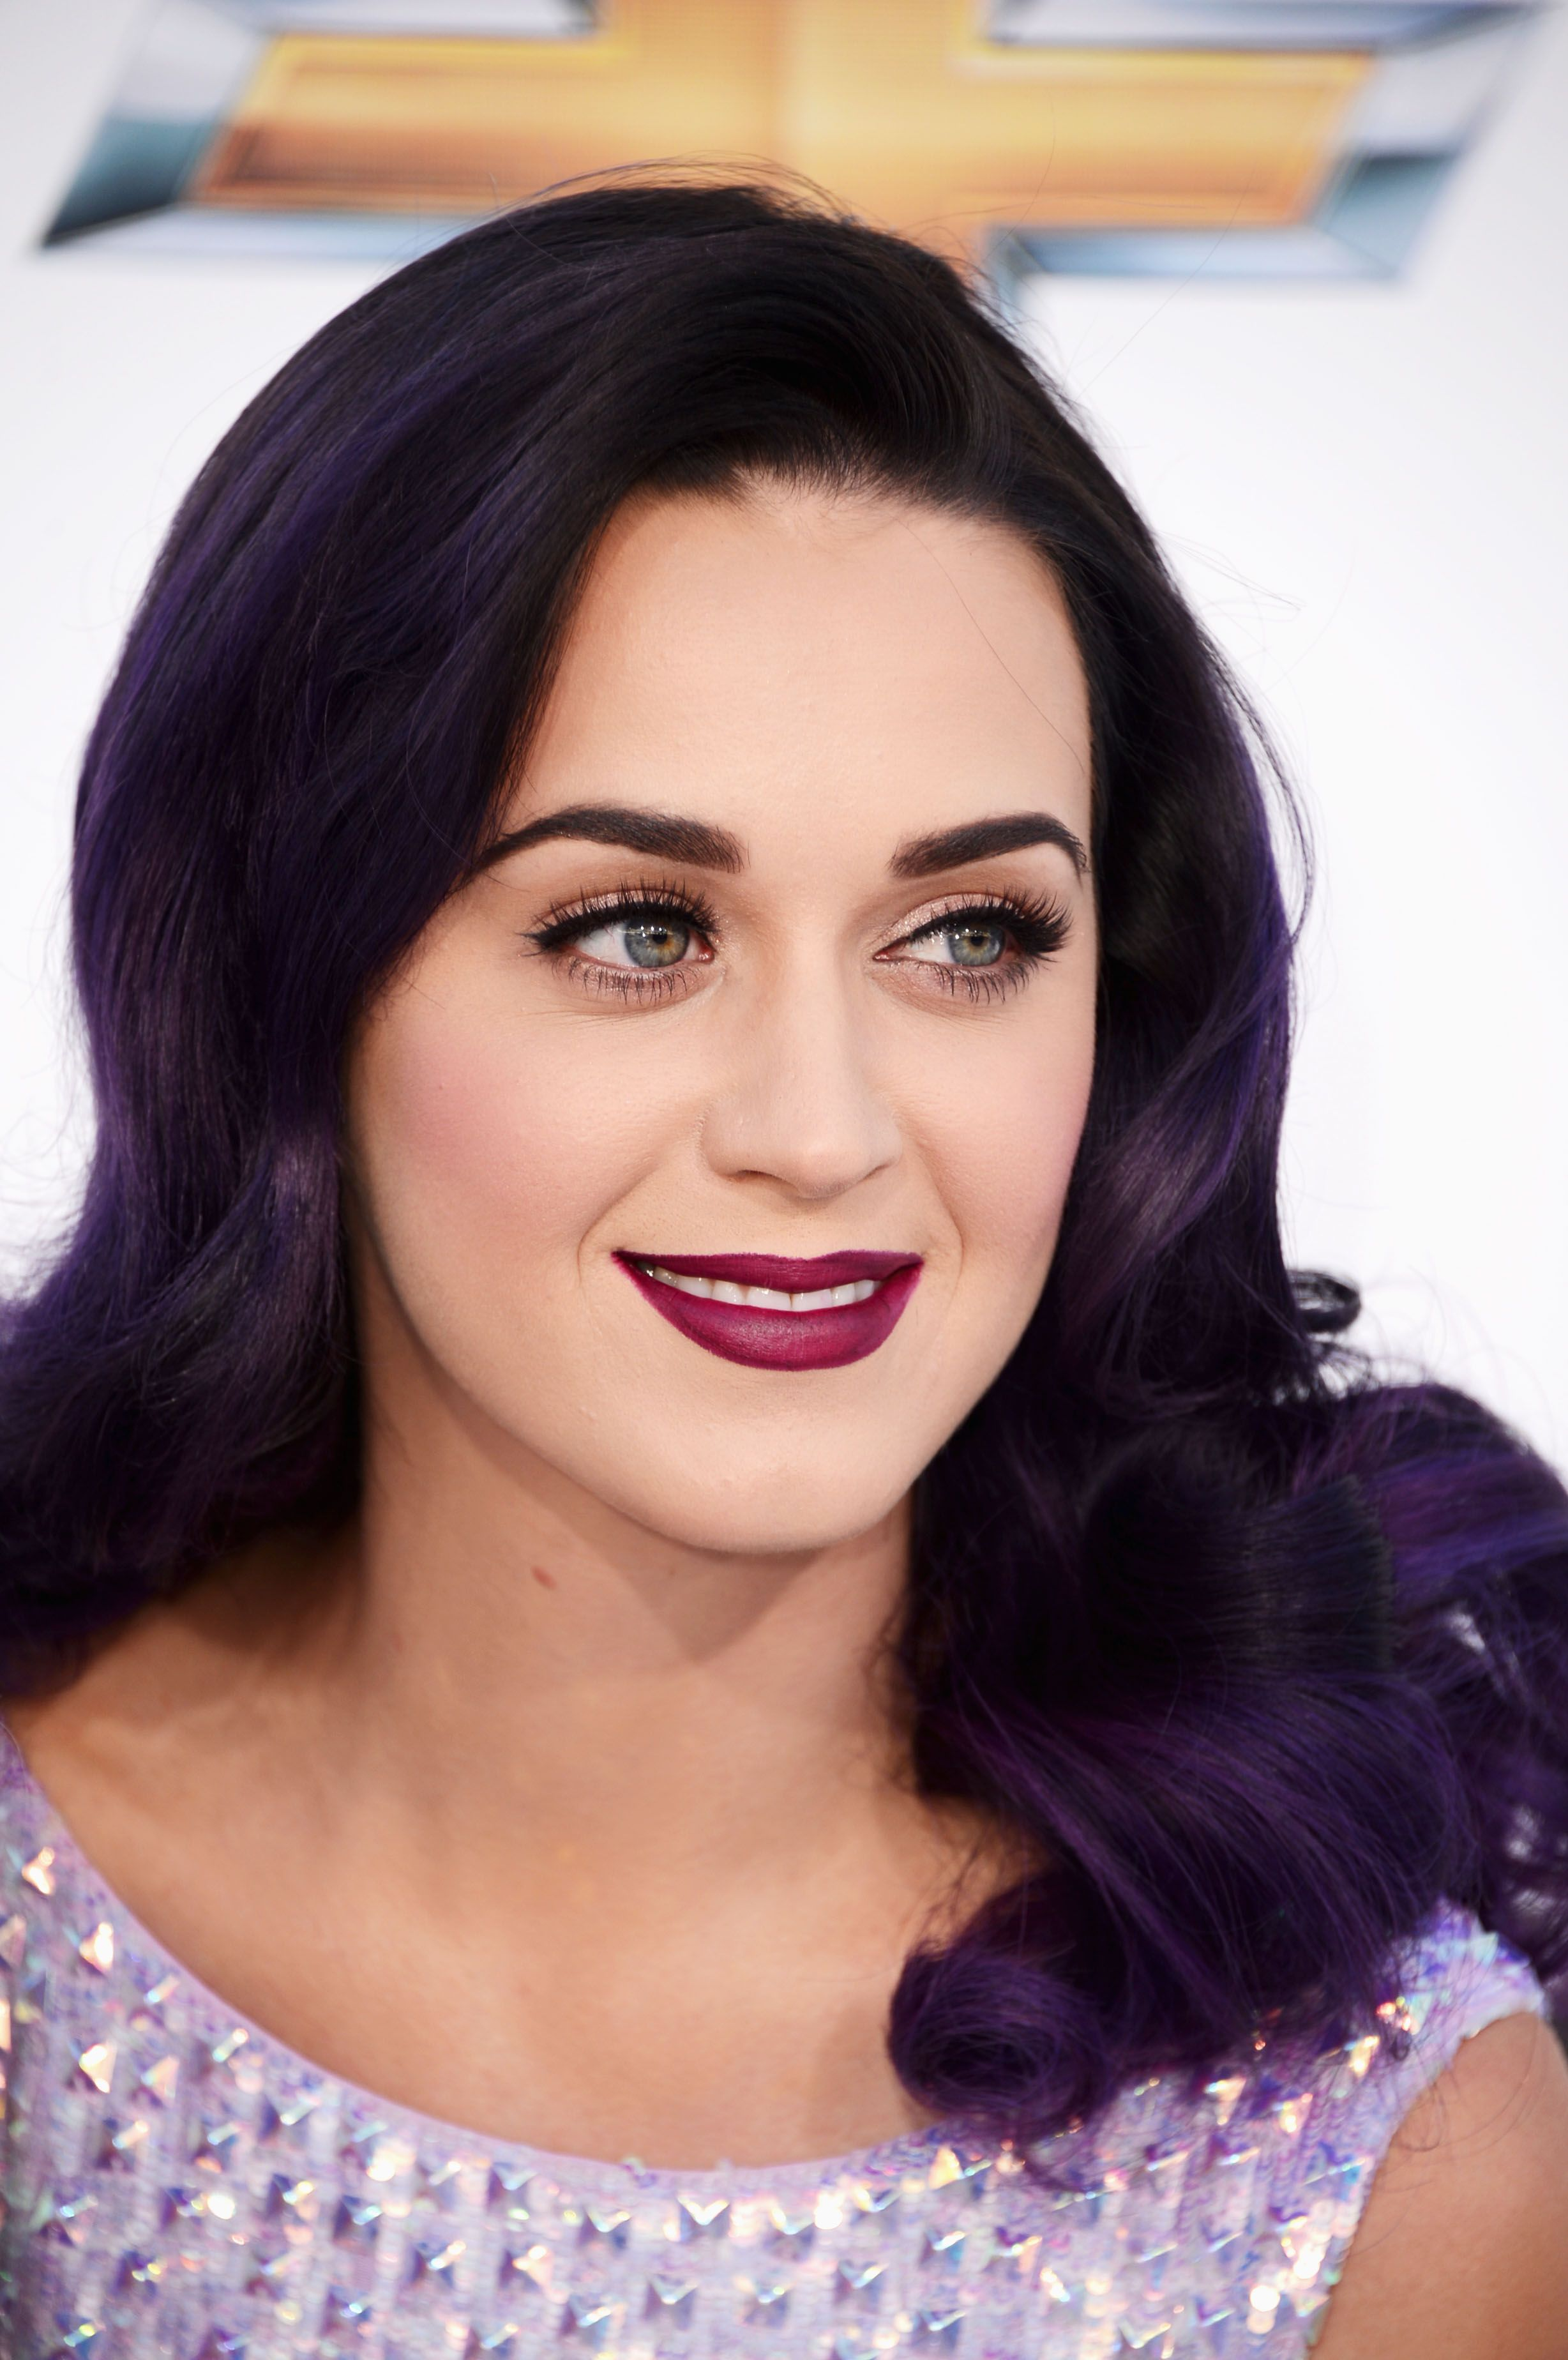 Deep purple Katy perry hair, Long hair with bangs, Katy